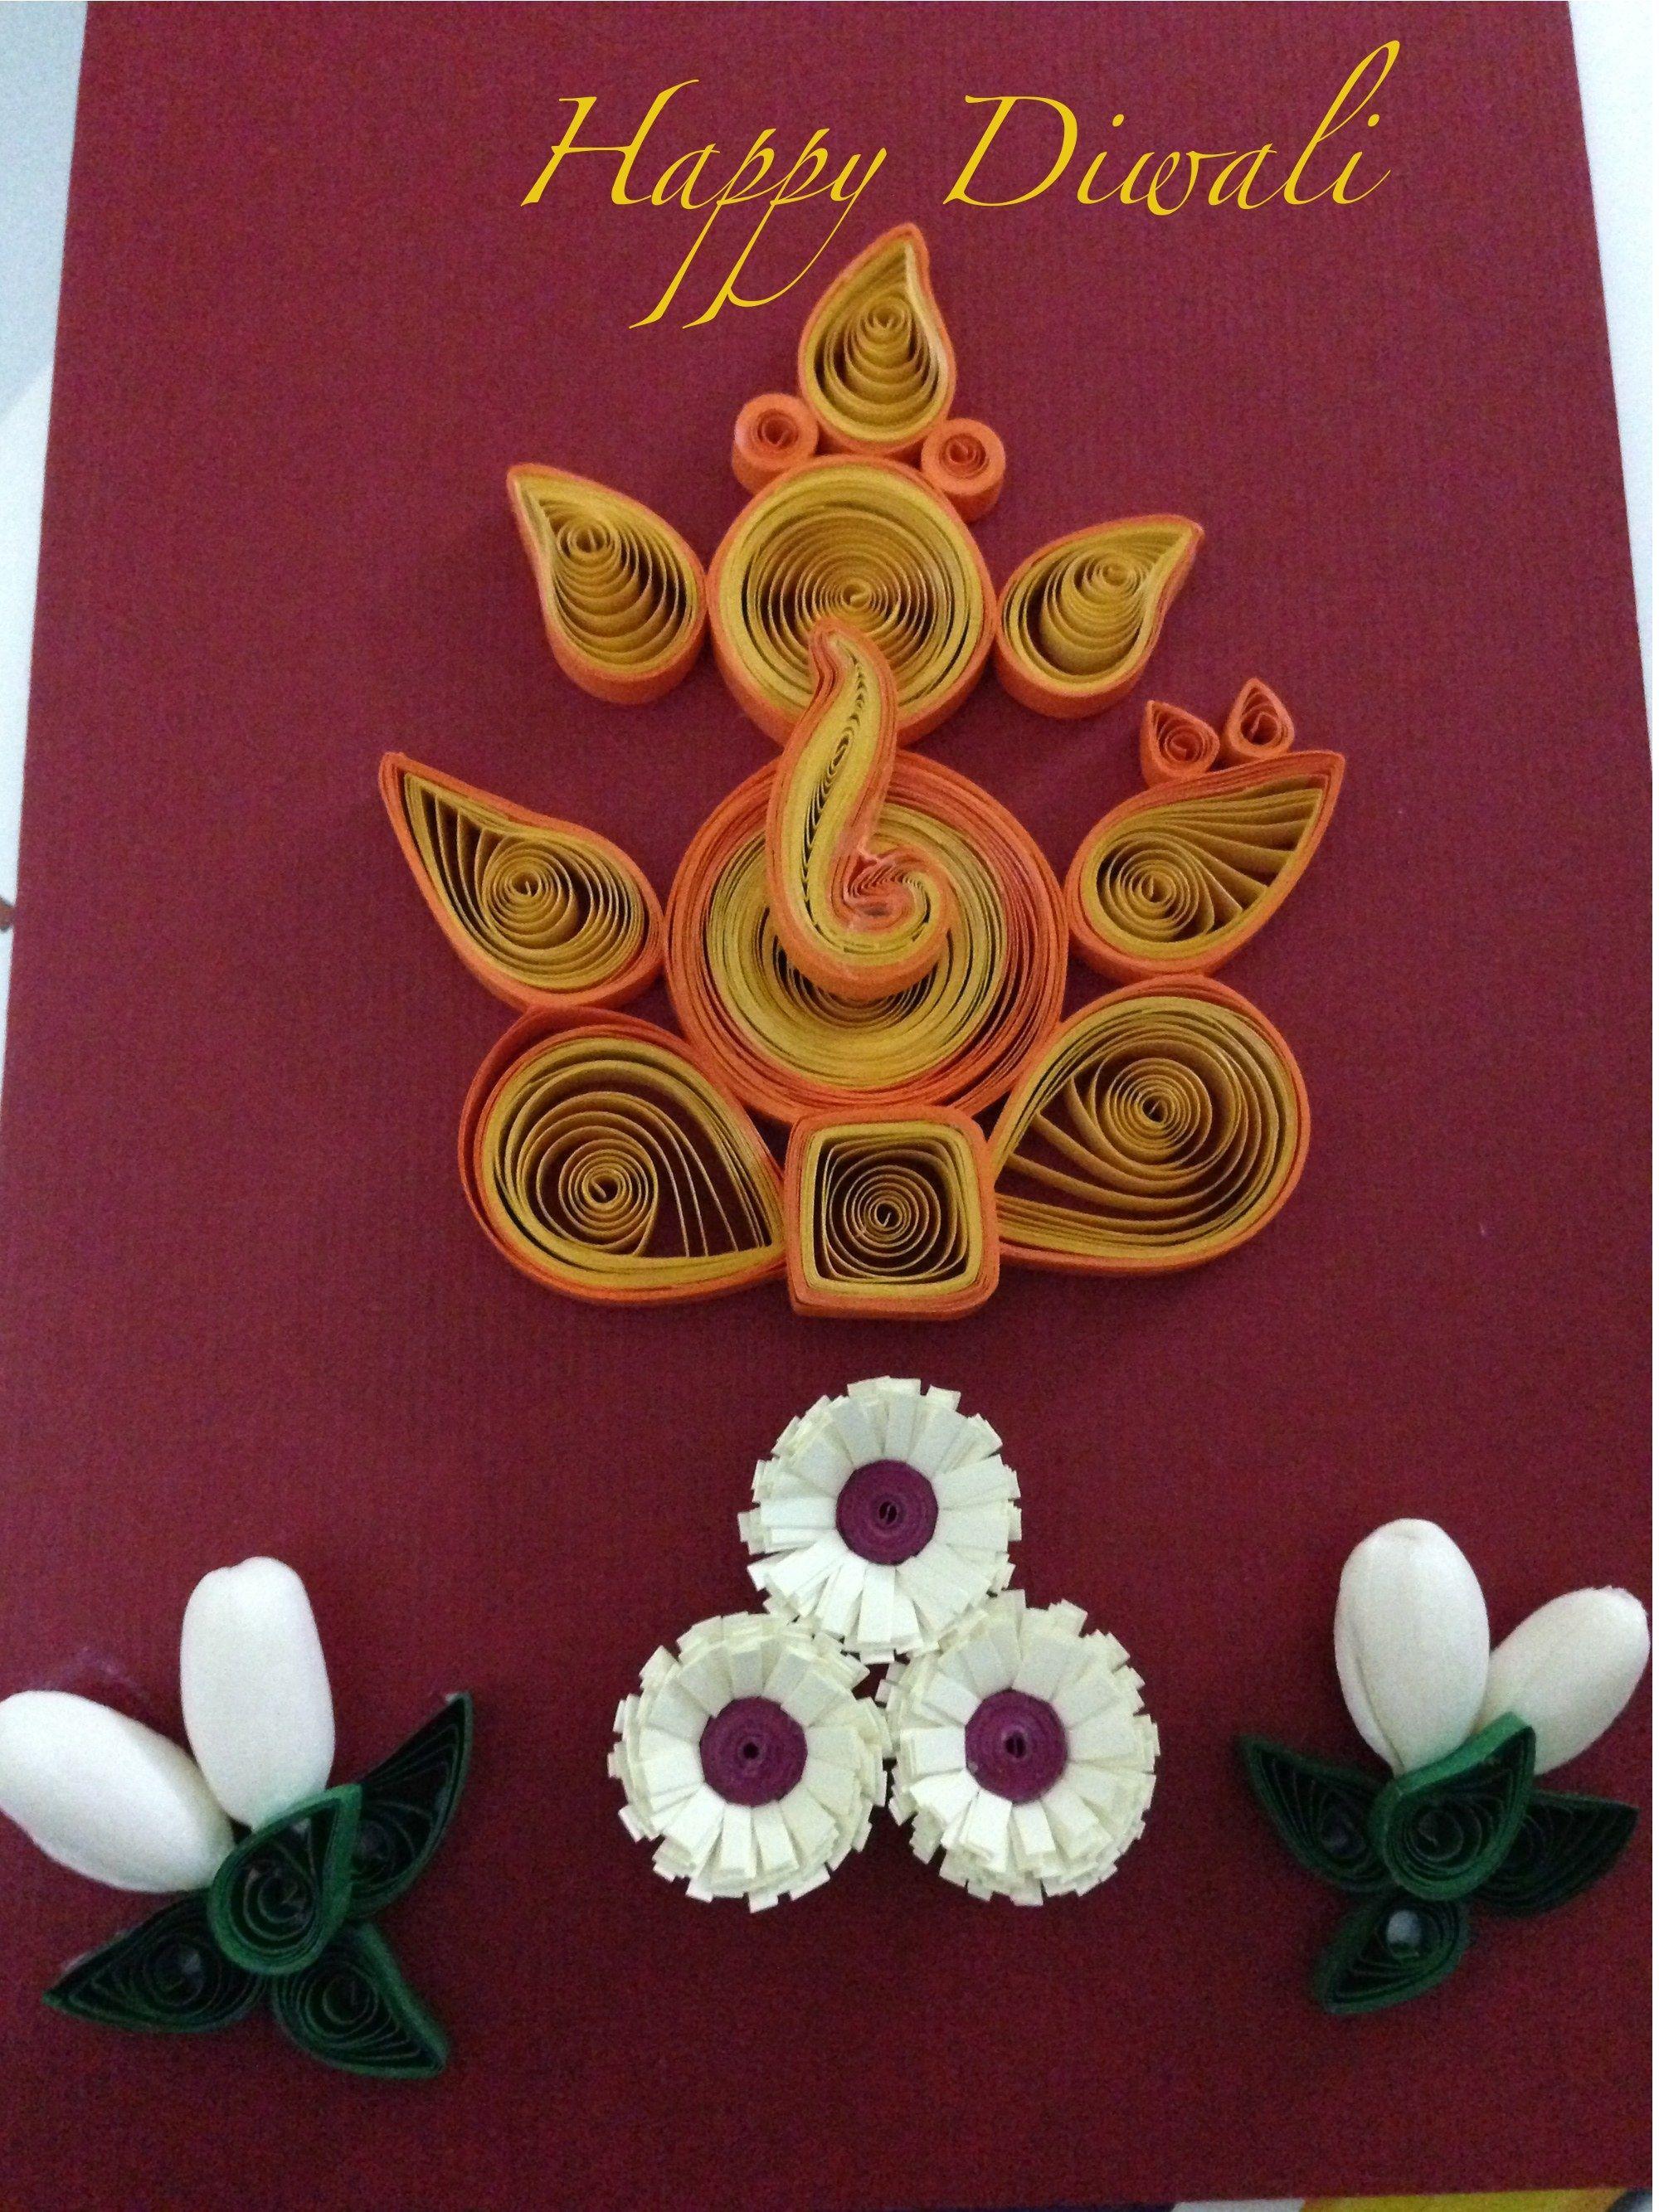 Happy diwali greetings cards images deepavali hindif 2015 2016 ganesha diwali greeting card online shopping for diwali sweet hampers by makemygift kristyandbryce Gallery